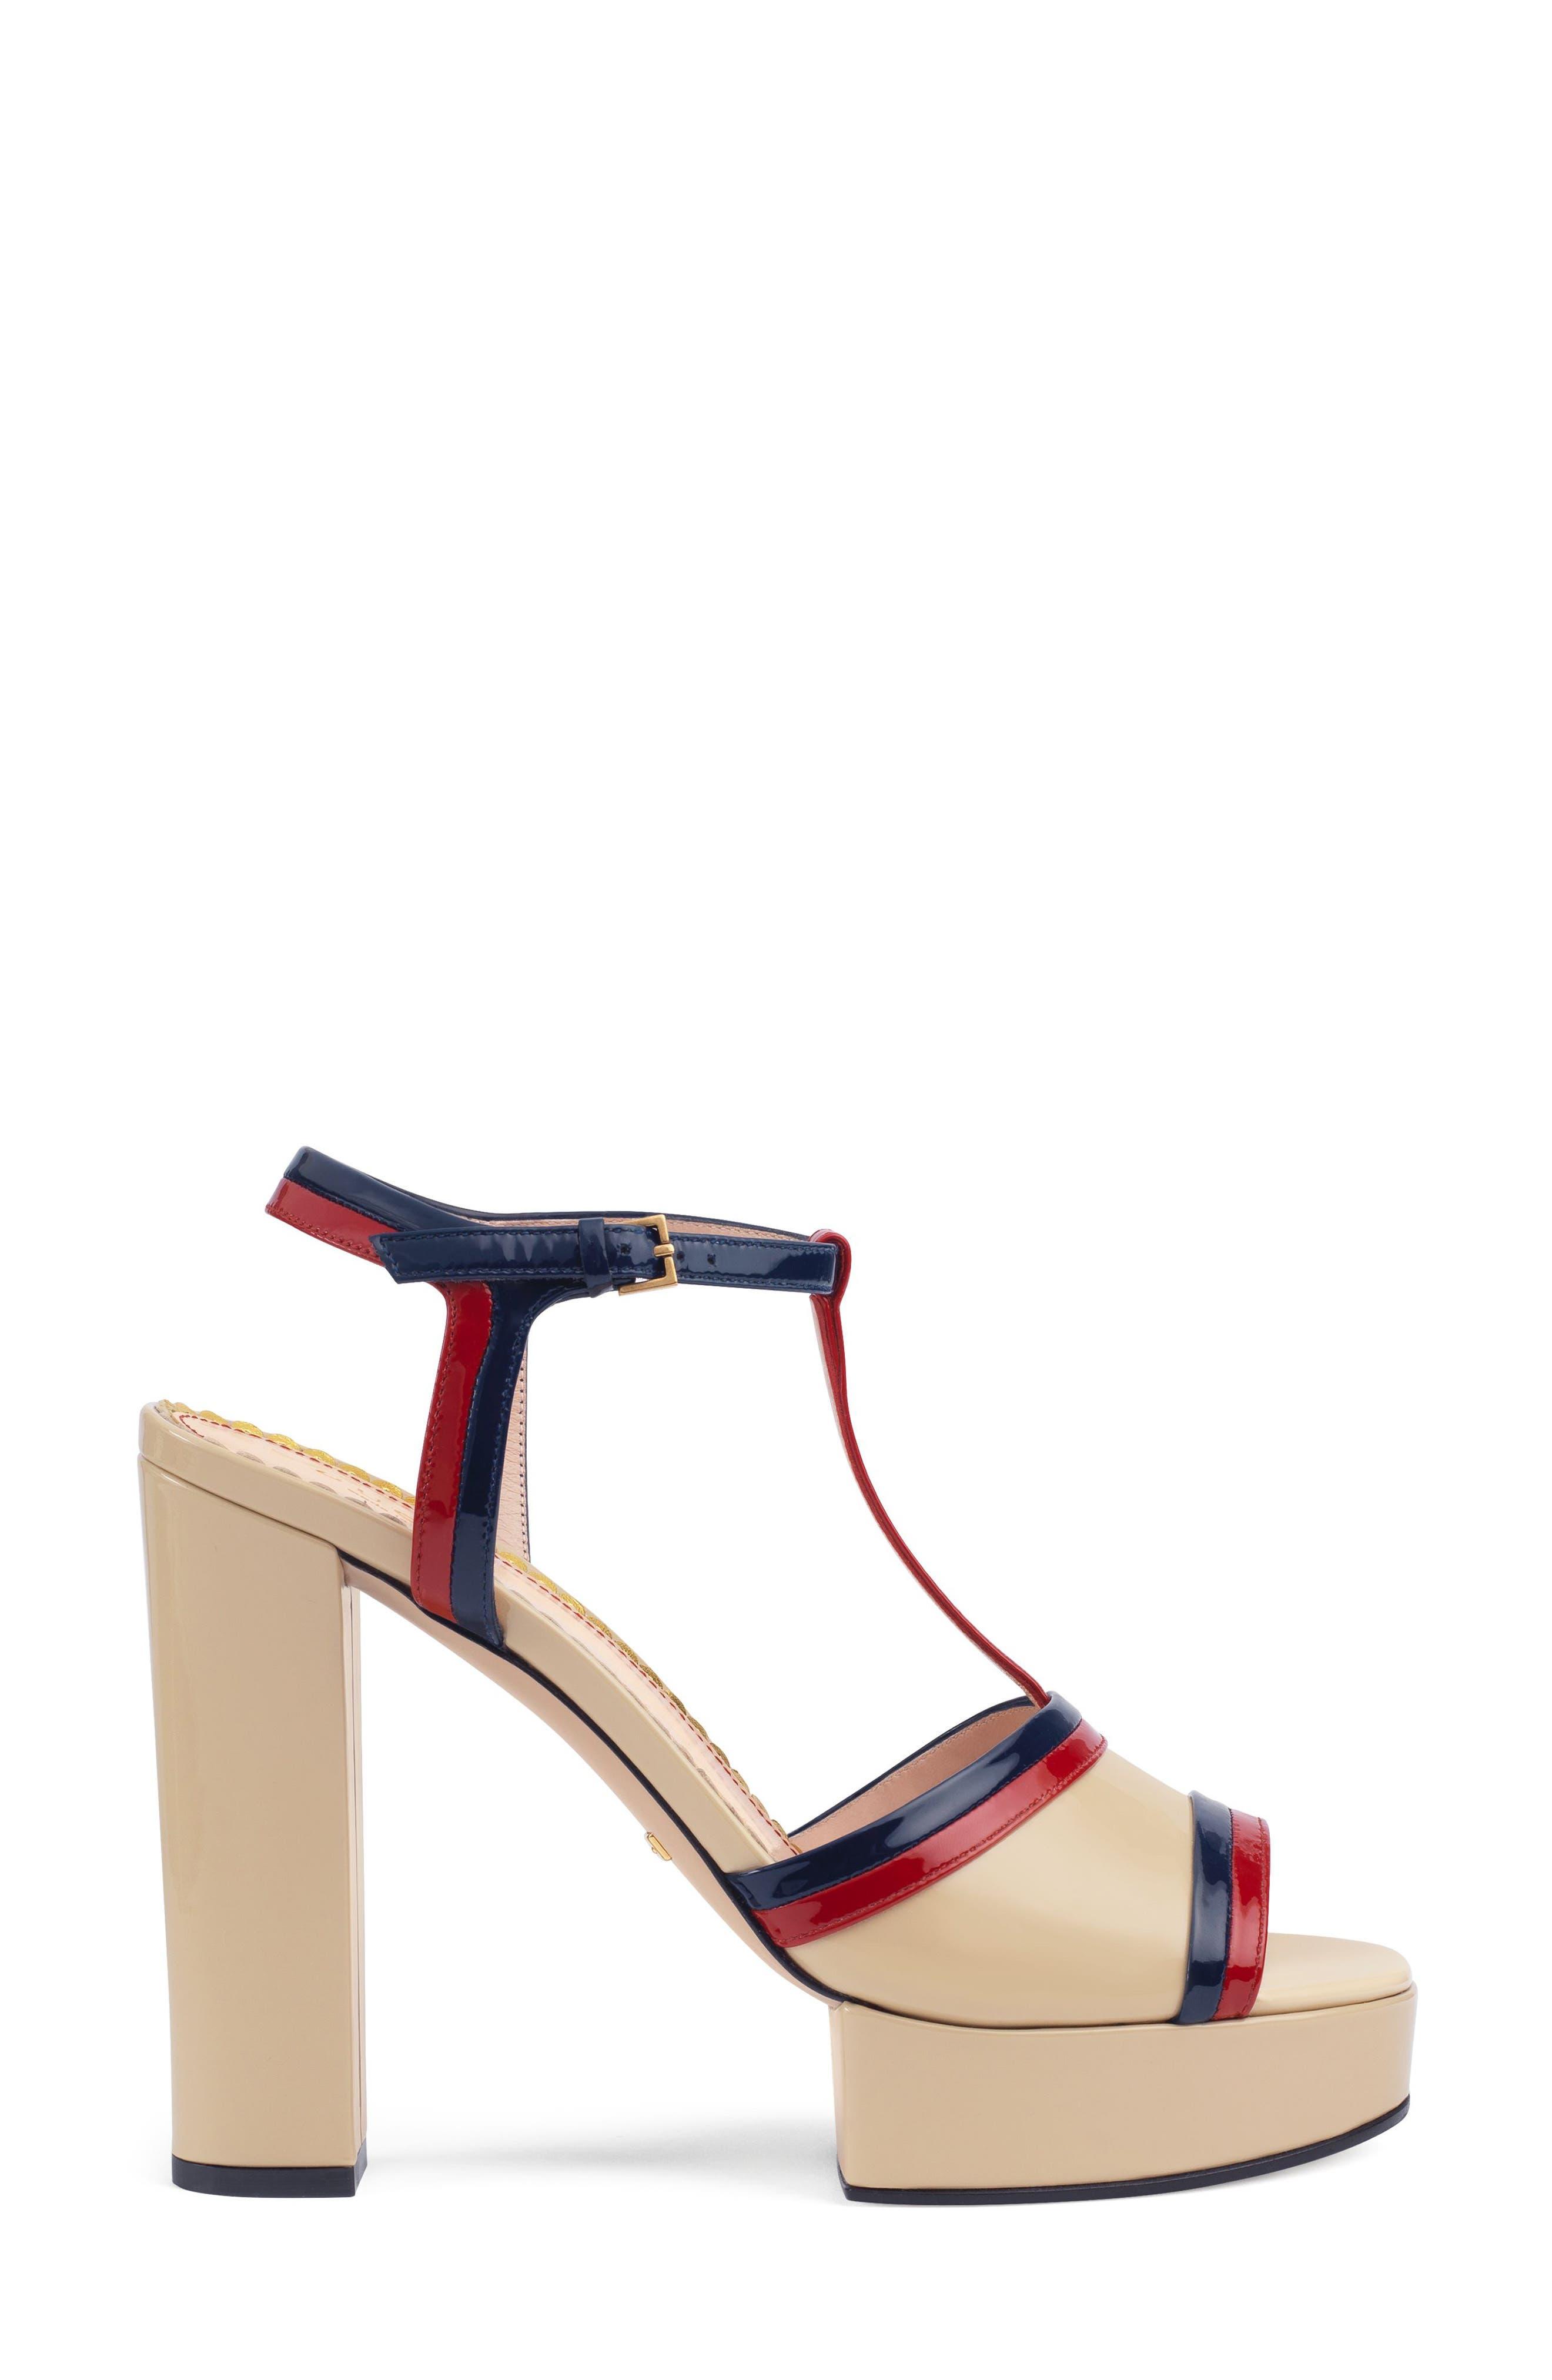 Millie T-Strap Platform Sandal,                             Alternate thumbnail 3, color,                             250